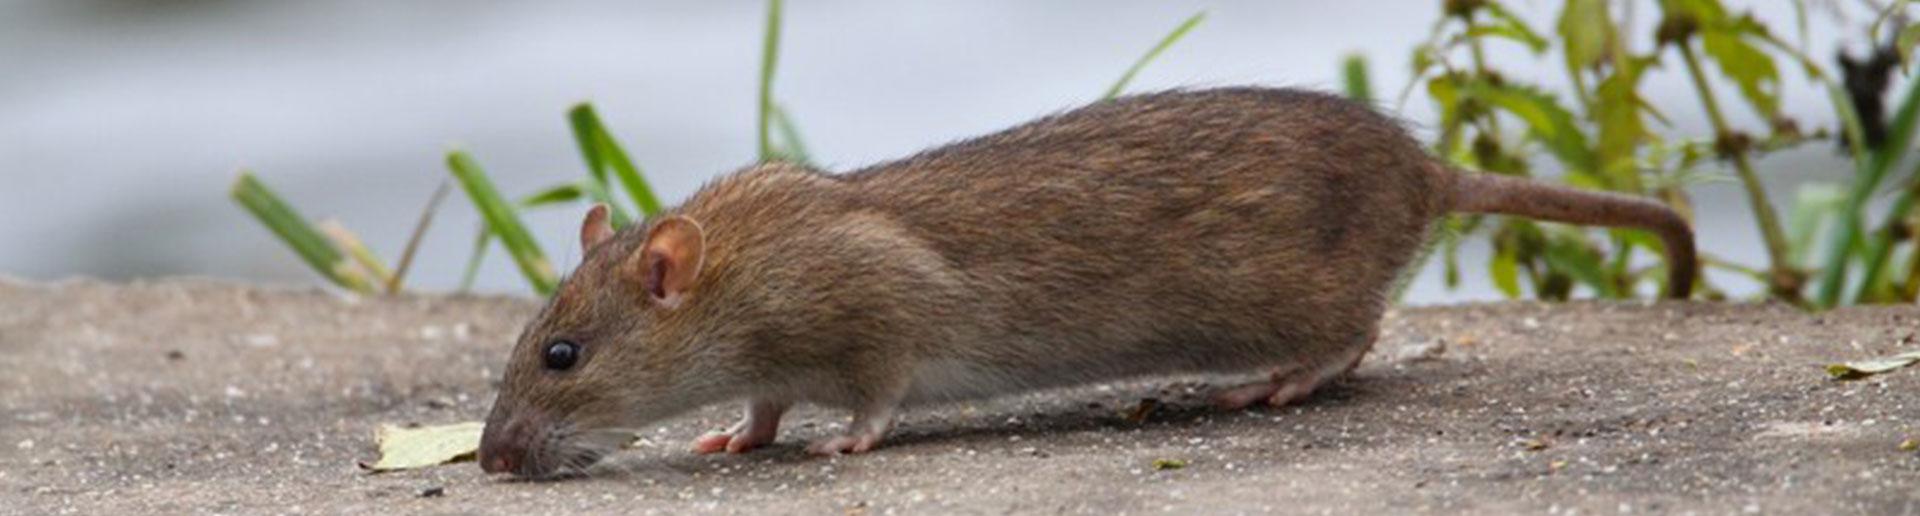 Löcher Im Garten Ratten Genial Ratten Im Garten Kammerjäger Ratgeber